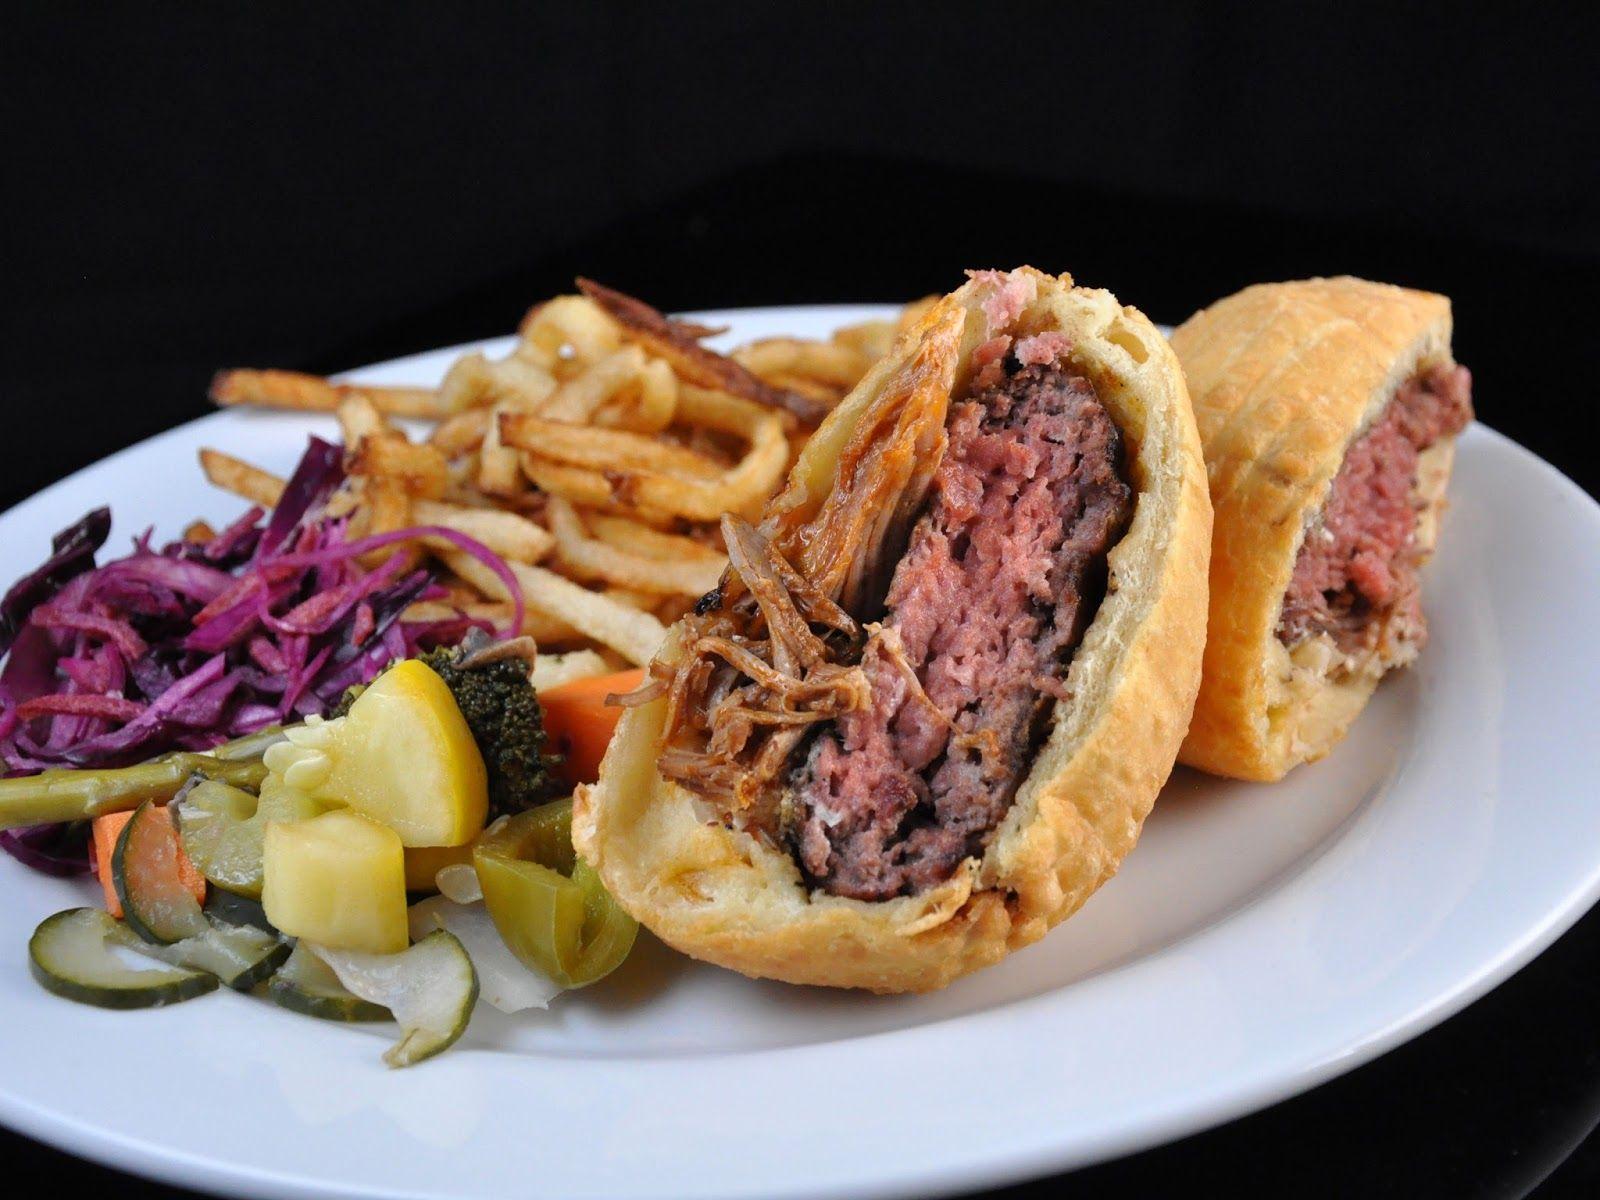 Forking Fantastic: Korzo's Deep Fried Burger At Home!